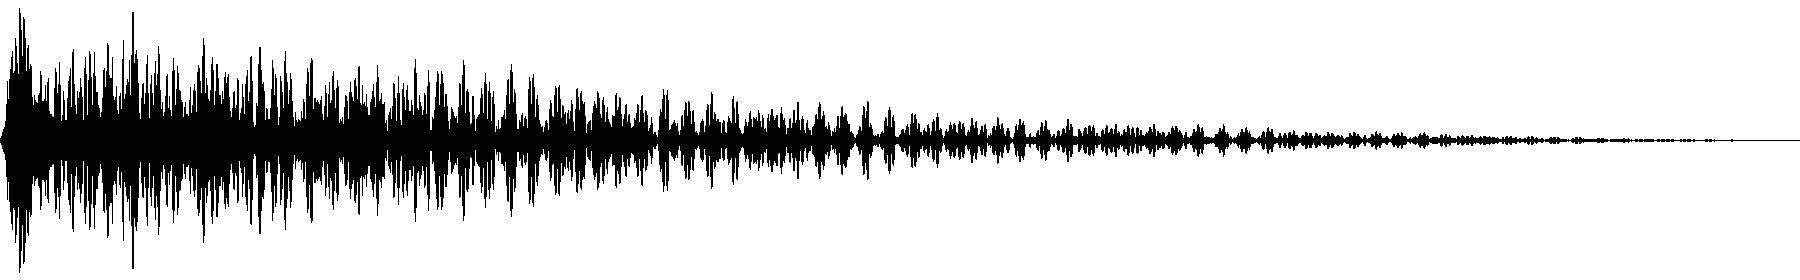 africankickdrum